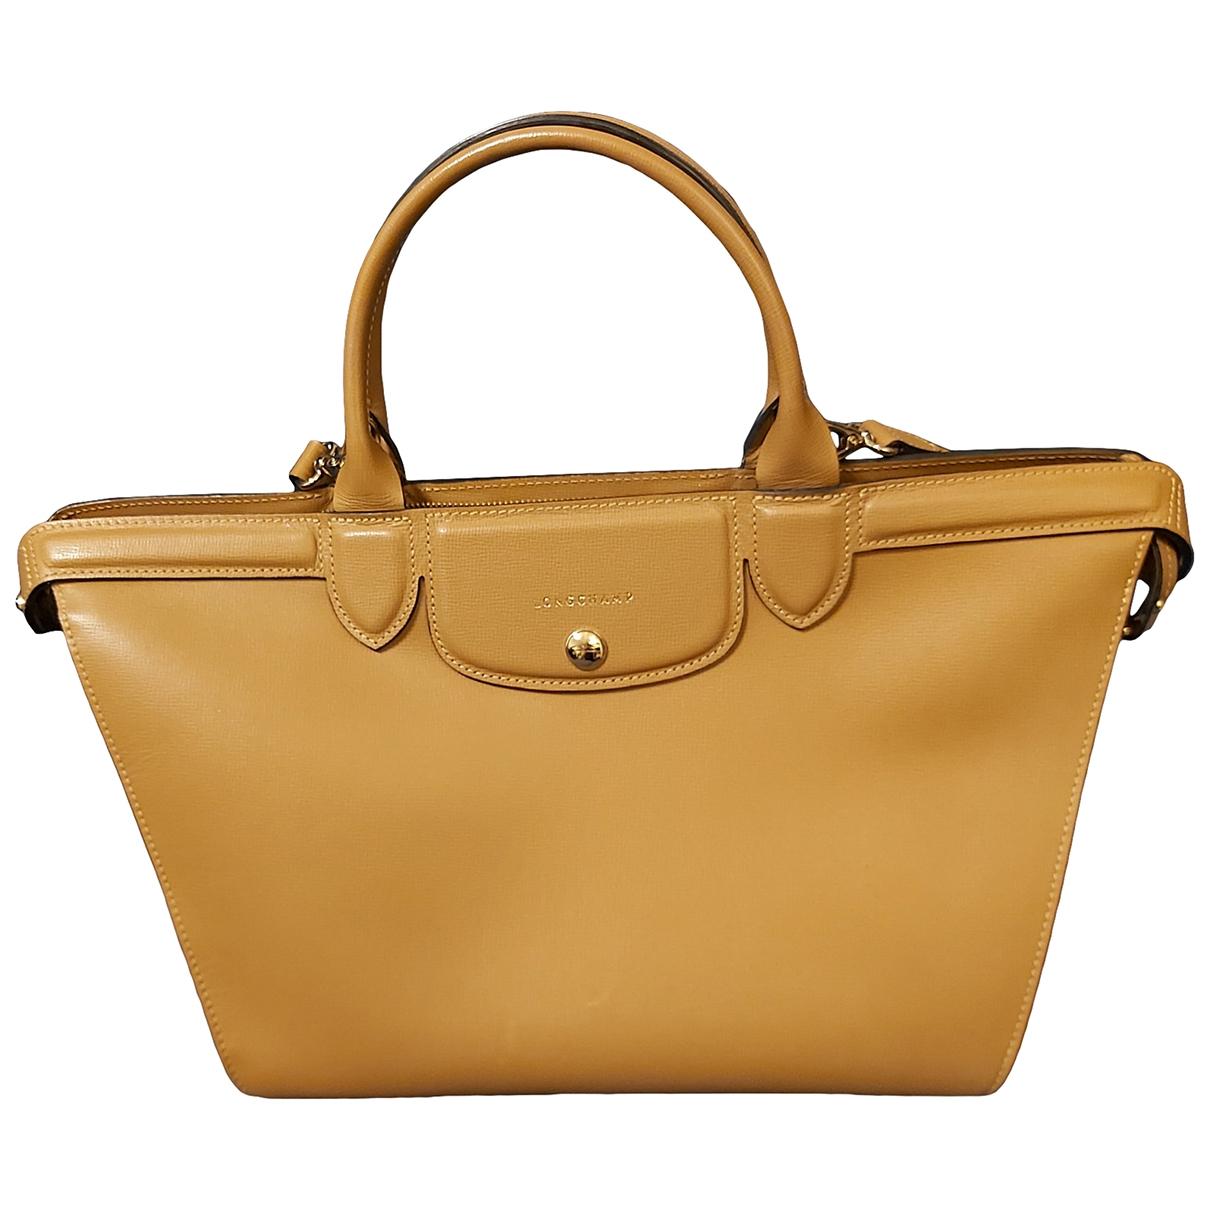 Longchamp Pliage  Beige Leather handbag for Women \N